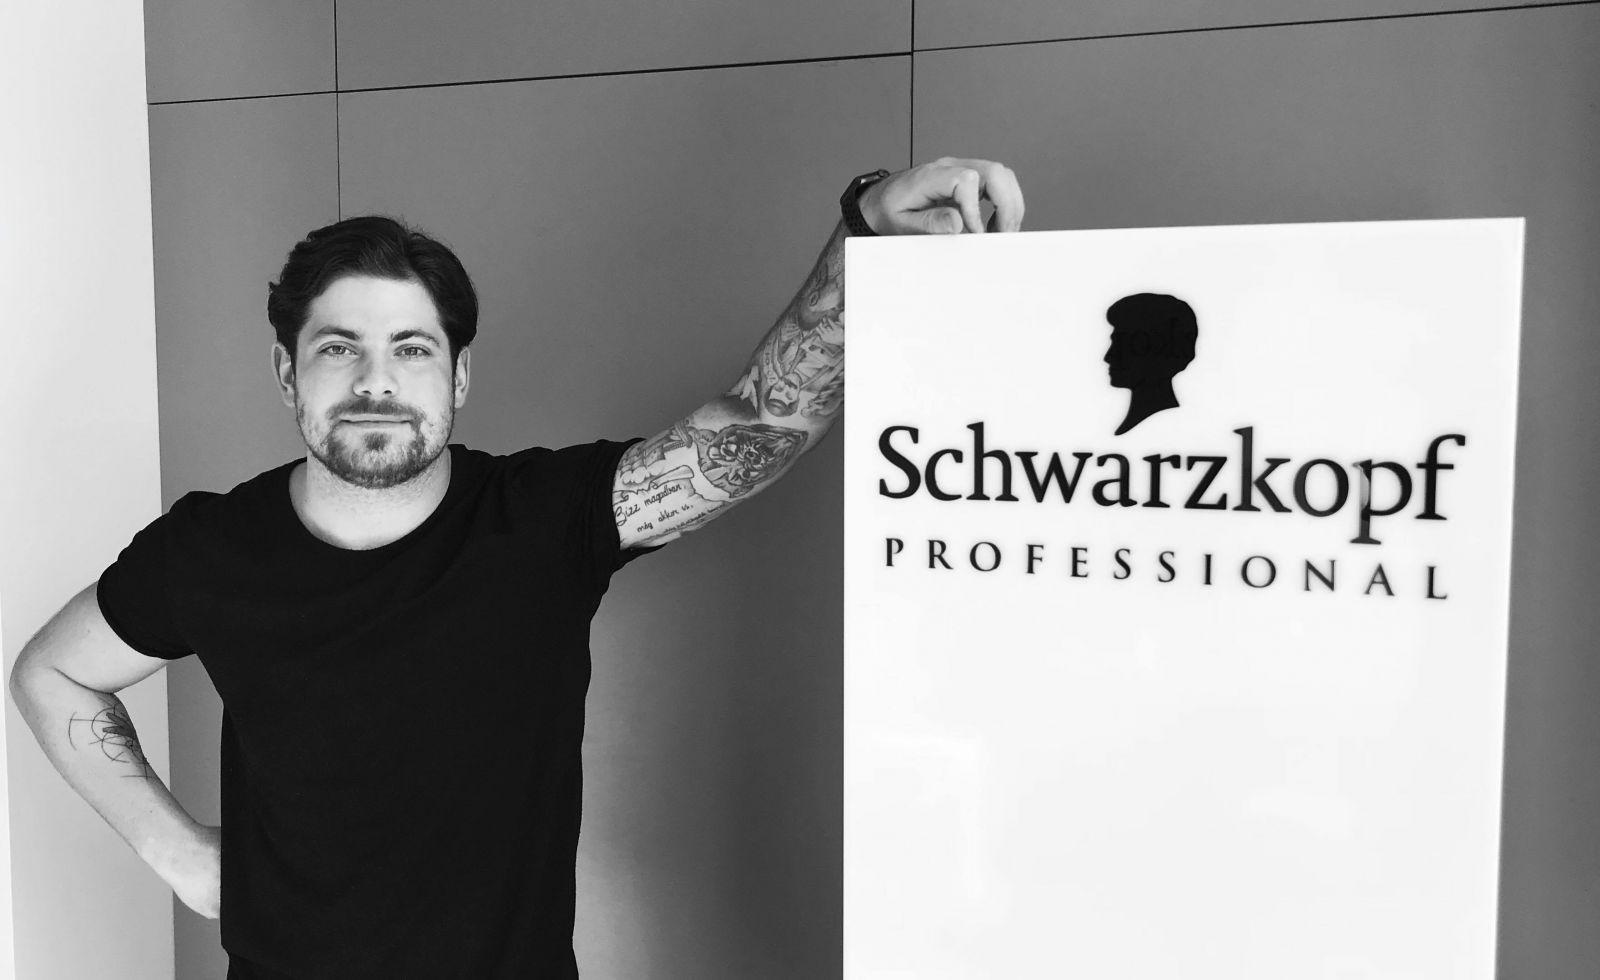 Schwarzkopf Professional Lukovics, Schwarzkopf Professional Fodrászat, Schwarzkopf Professional Termékek, Schwarzkopf Professional BC Fibre Clinix, Schwarzkopf Professional Hajápolás, Online időpont foglaló program_BWnet